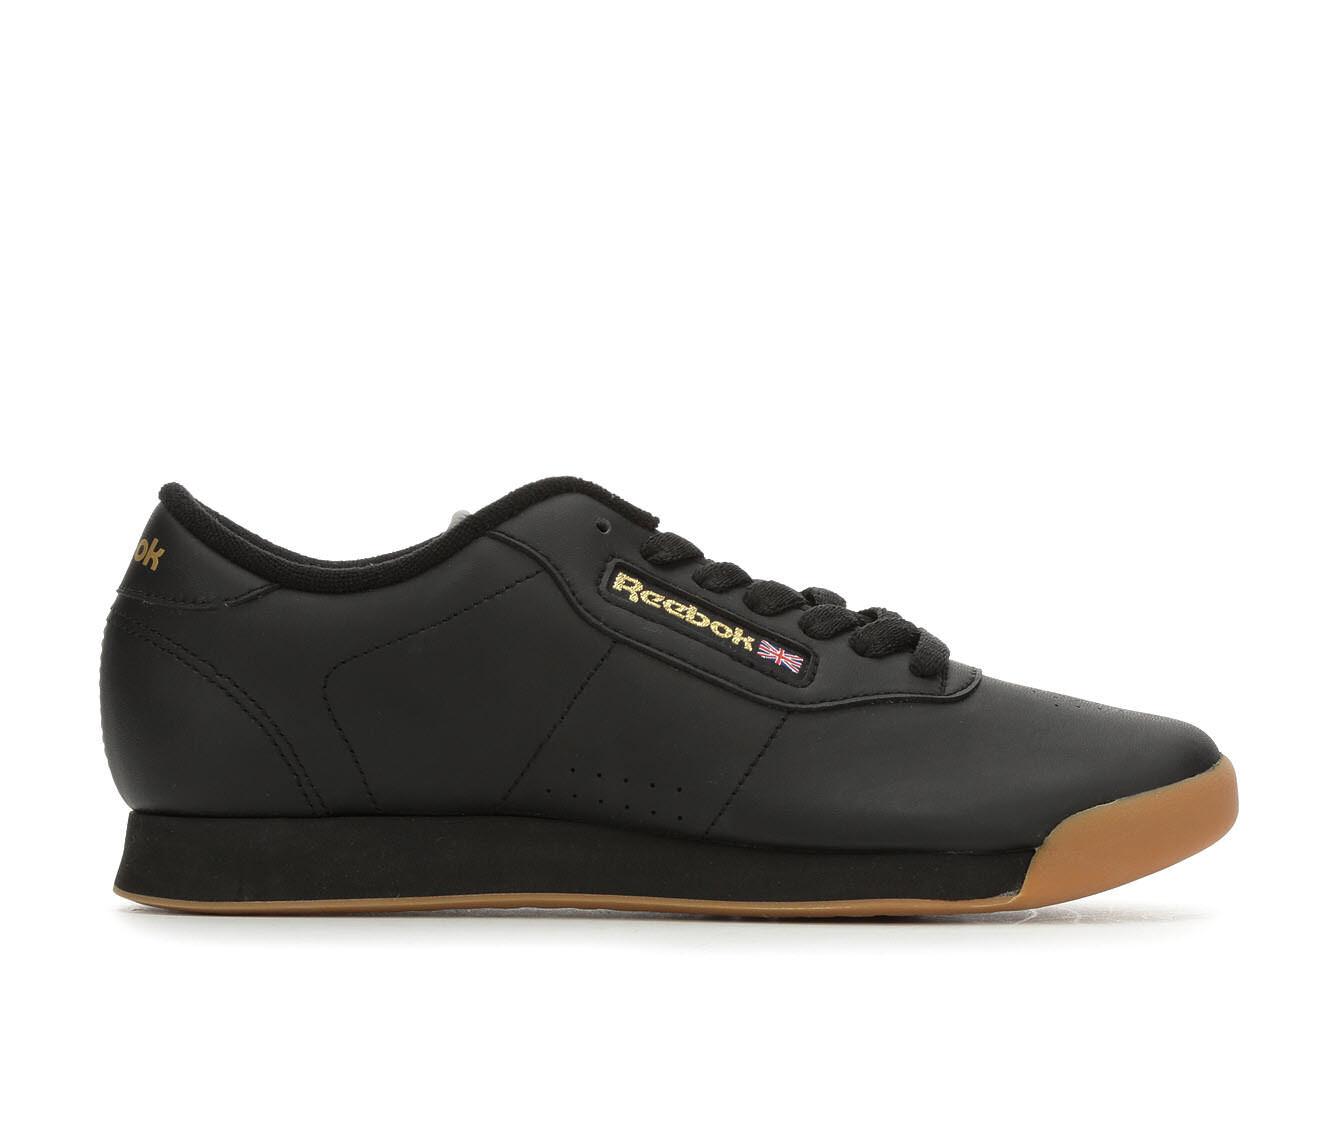 Women's Reebok Princess II Retro Sneakers Black/Gum